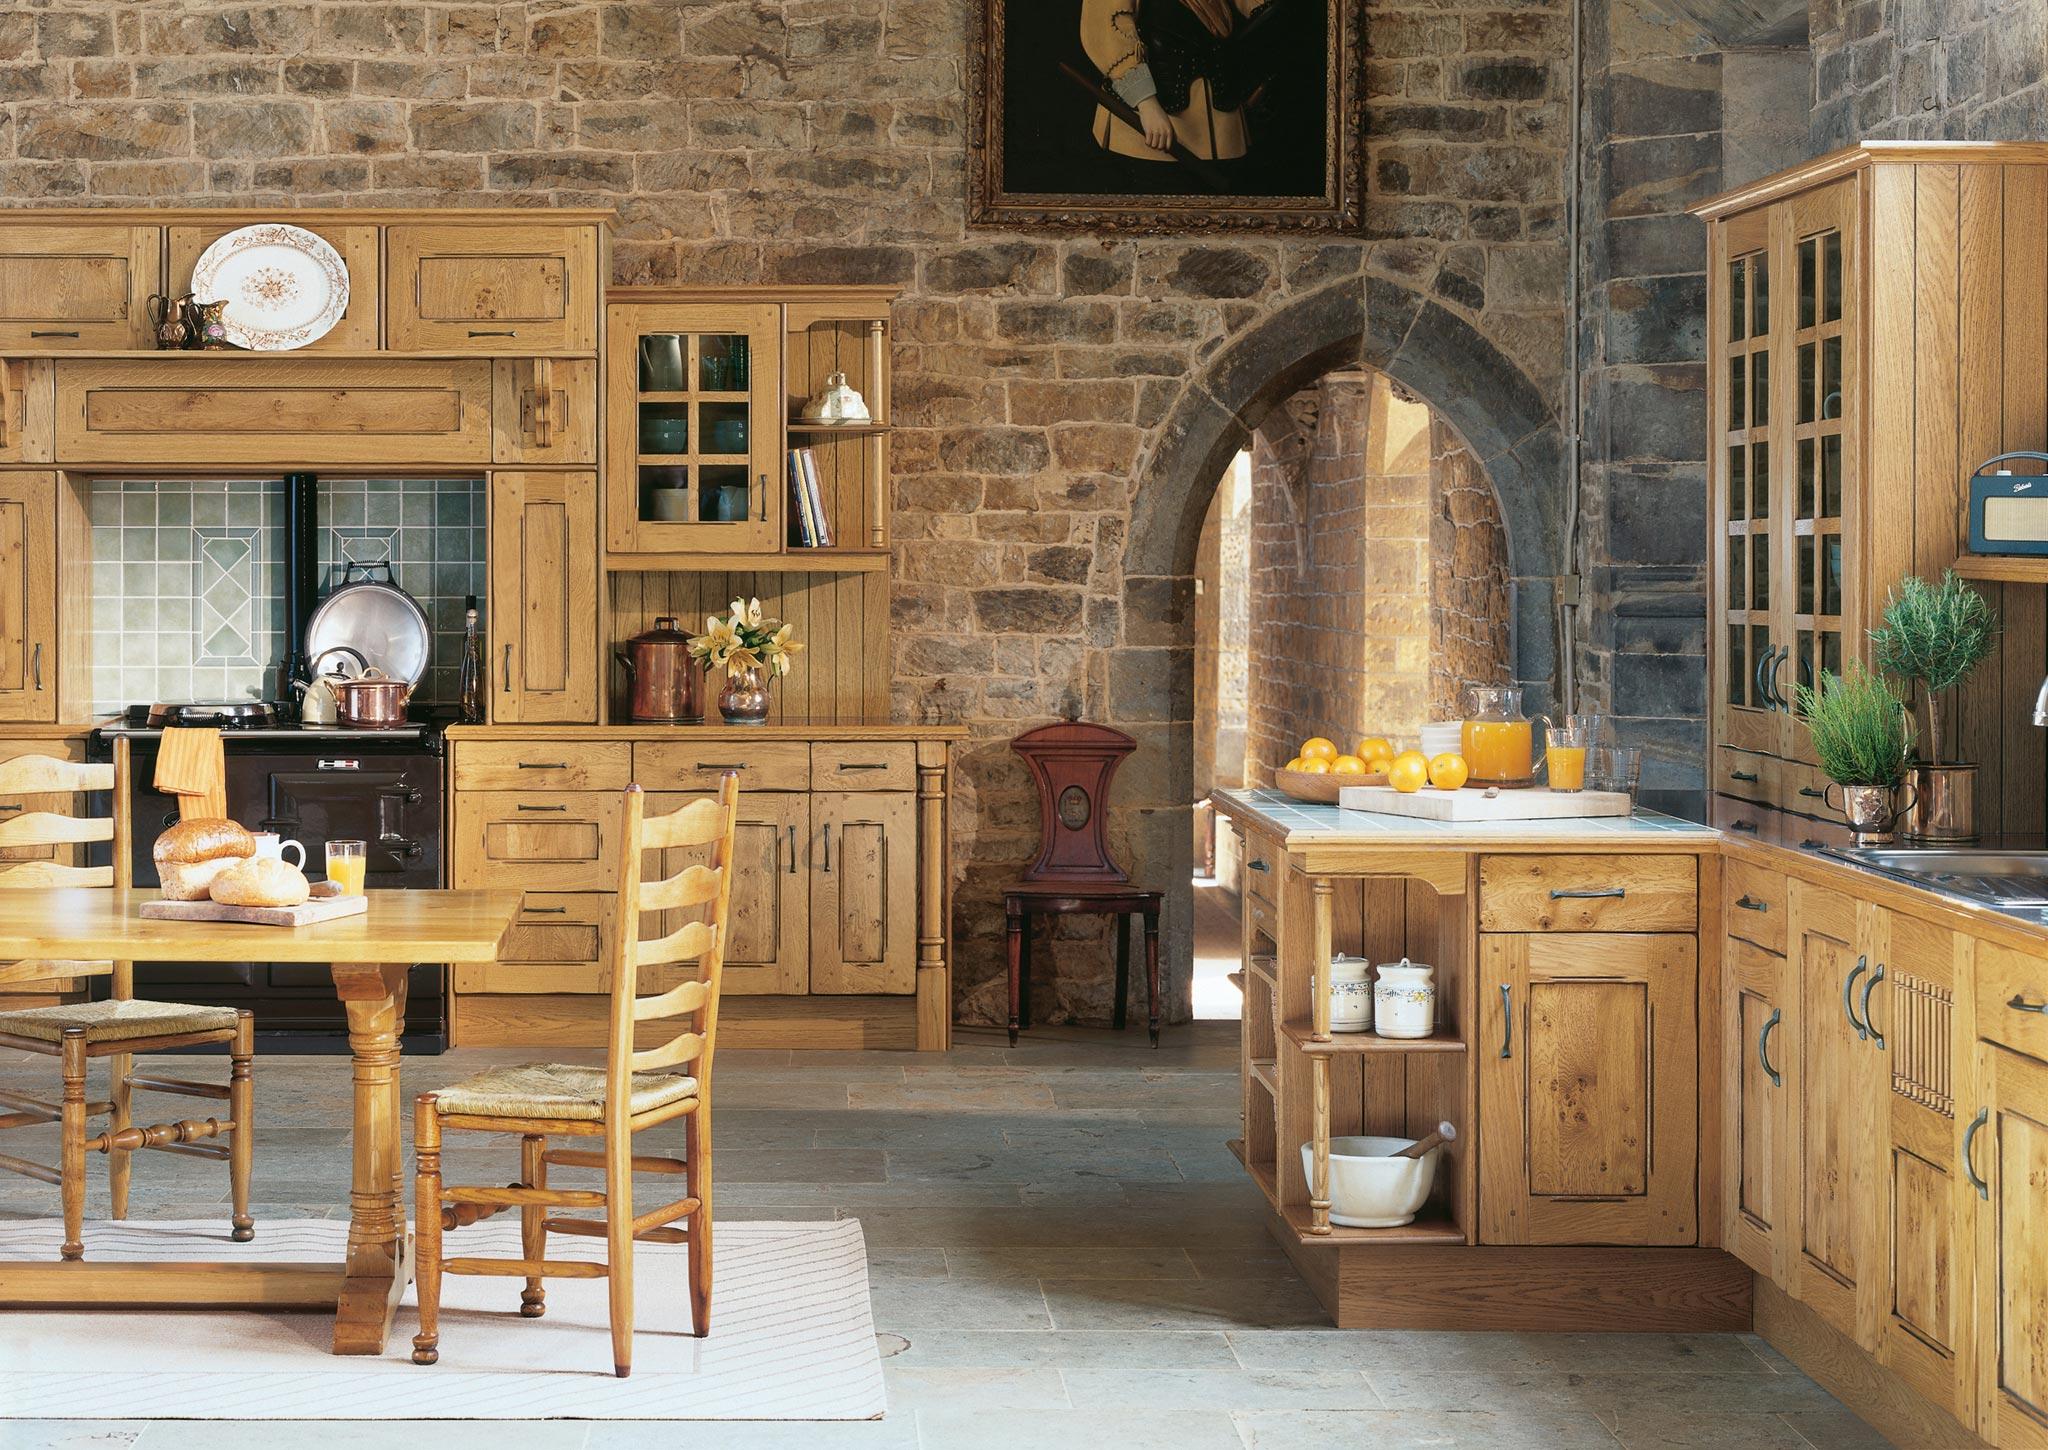 Преимущества в оформлении кухни по авторской концепции в духе аристократизма в Англии